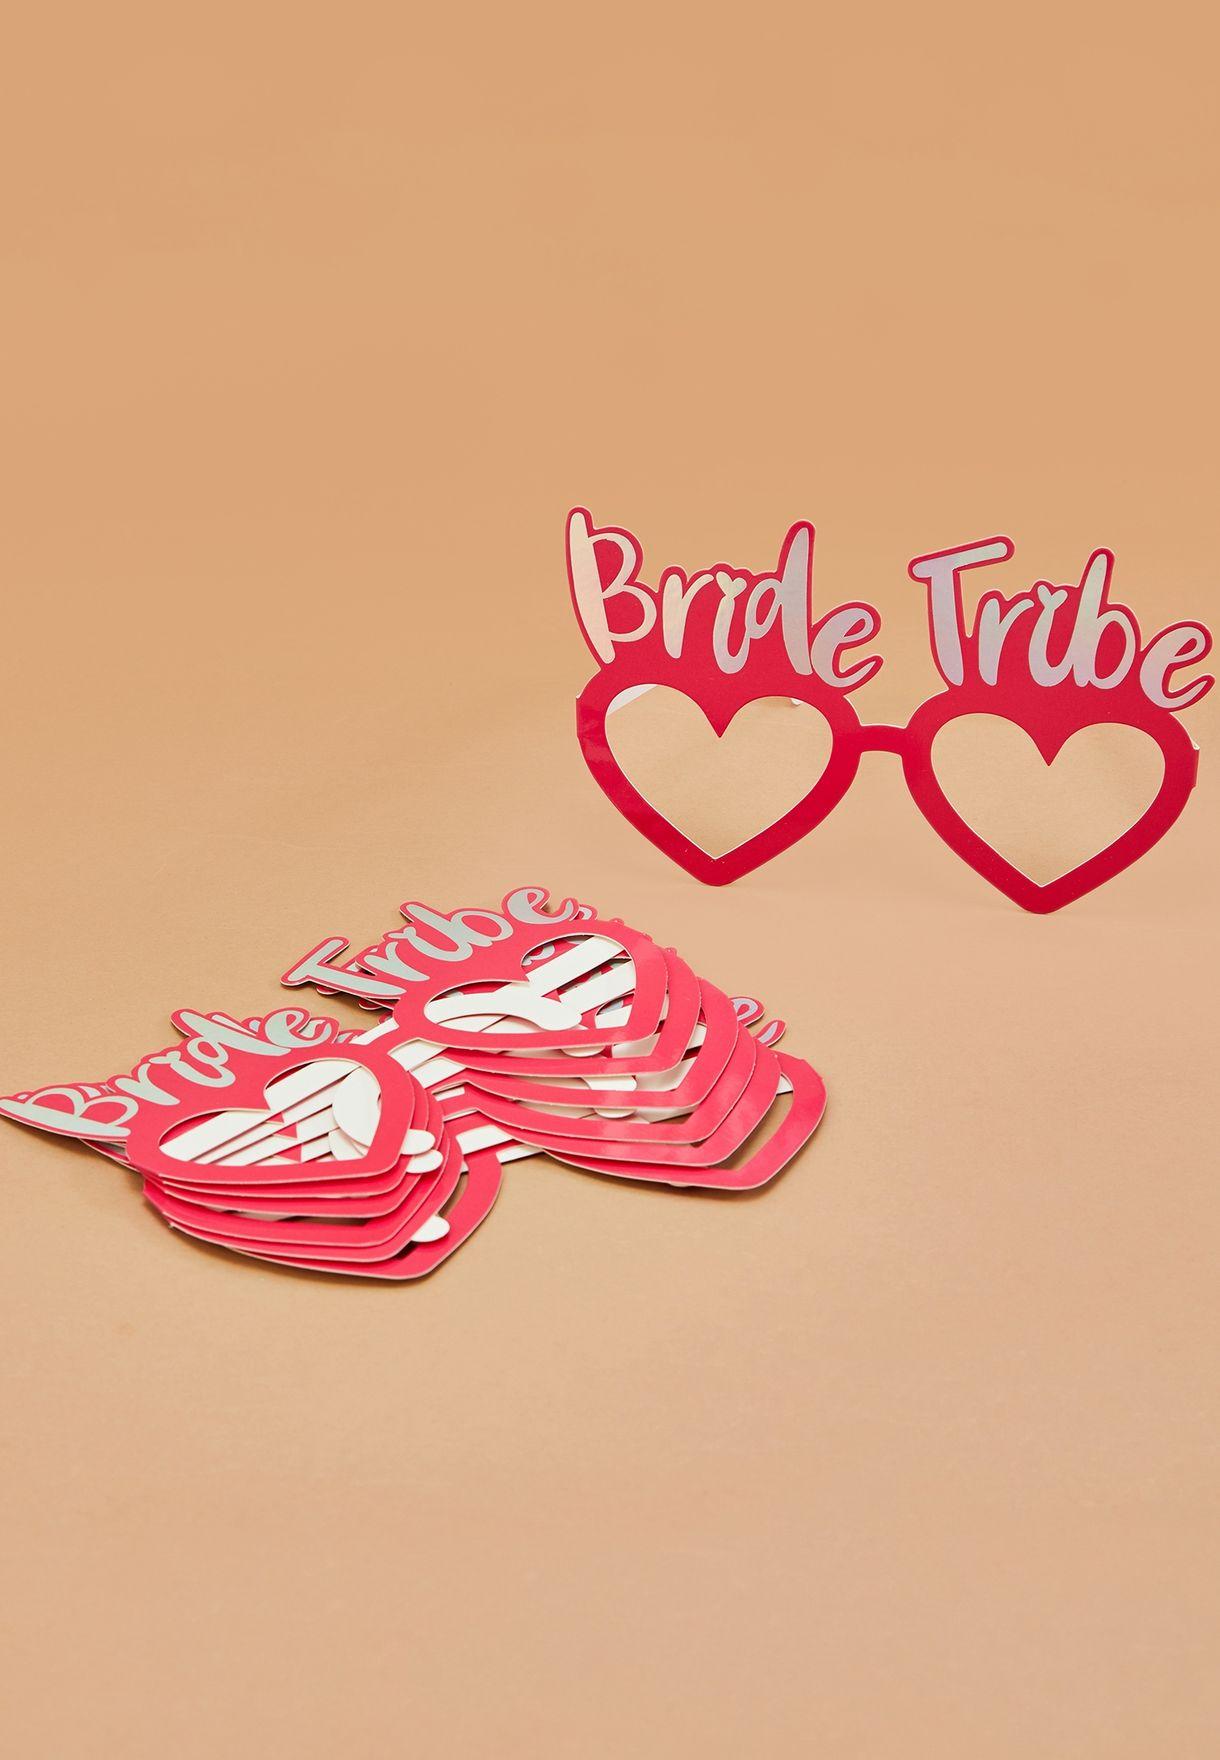 8 Pack Bride Tribe Fun Glasses